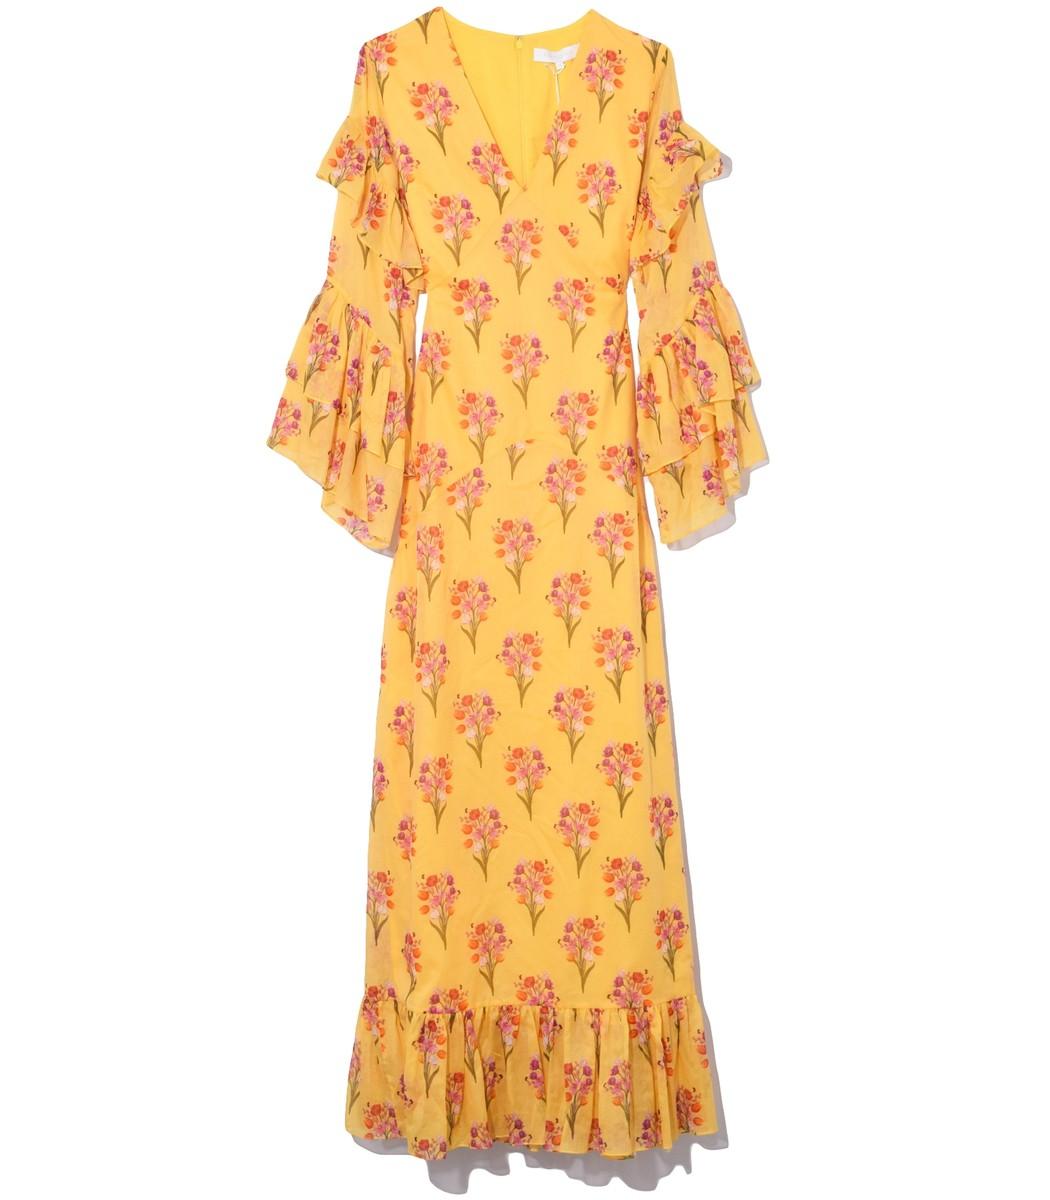 Borgo De Nor Long Luna Cotton Voile Dress in Yellow